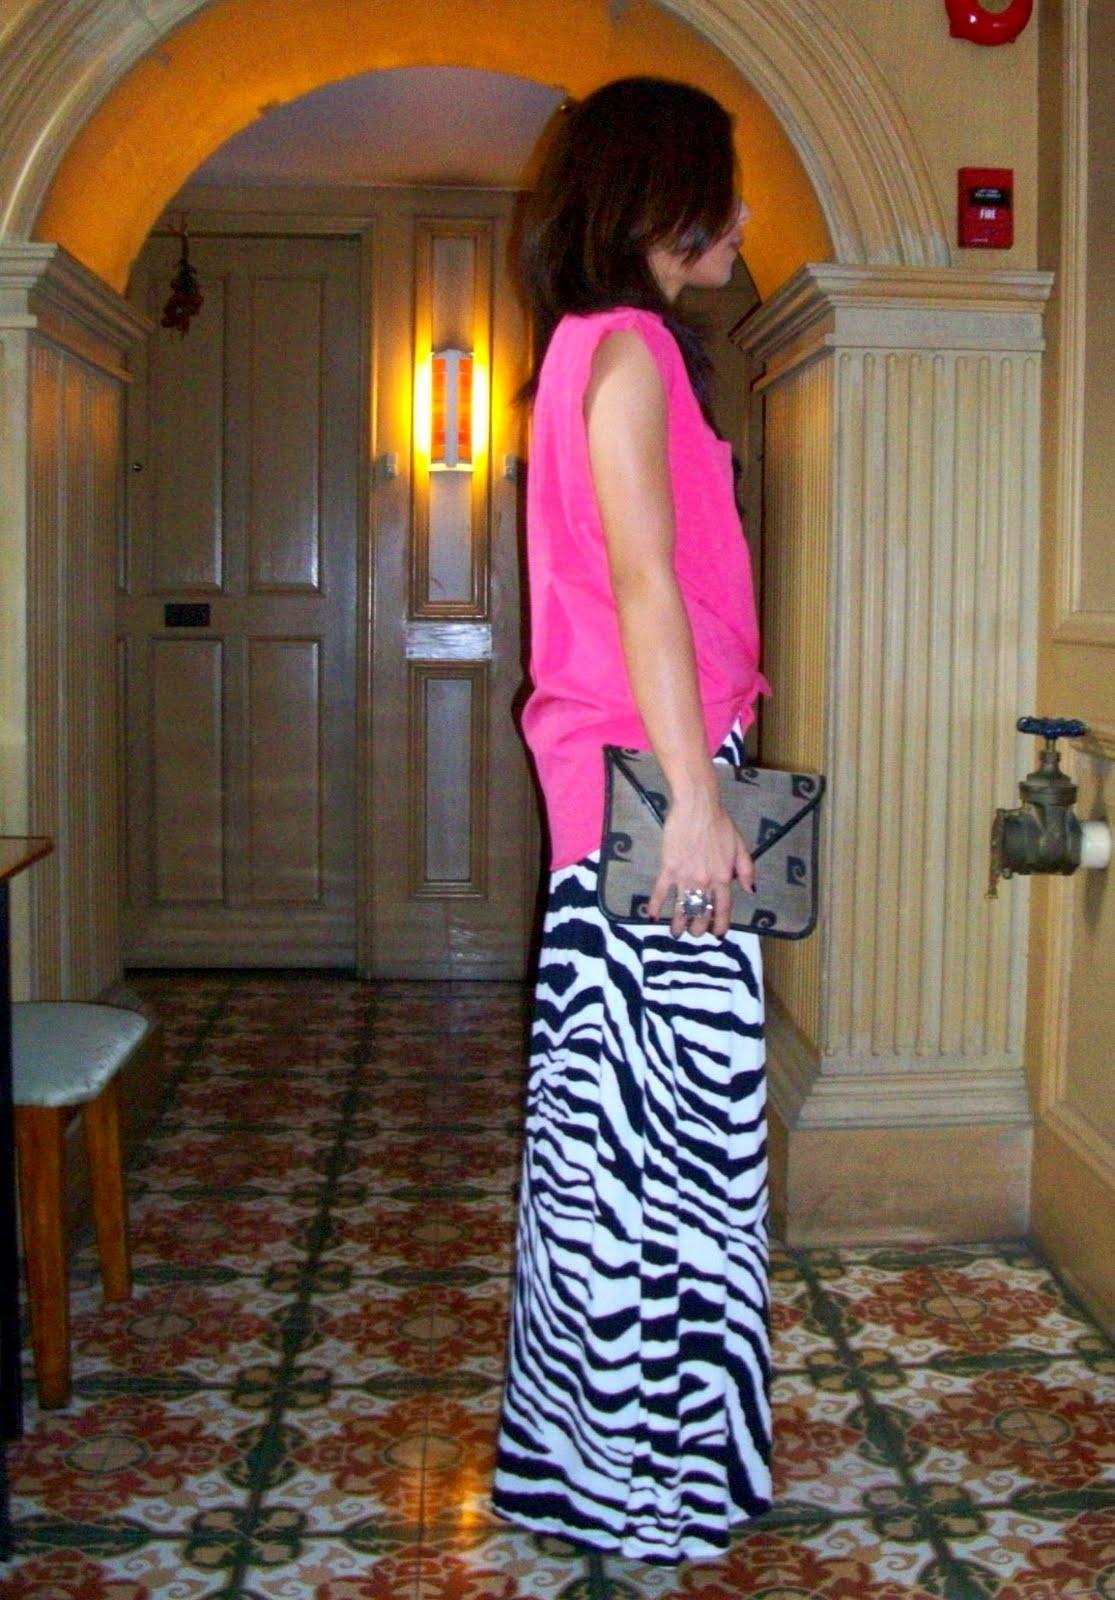 f263474f85d1 pink manila top, DIY necklace, zebra maxi dress used as a skirt, vintage  pierre cardin clutch, jessica simpson danys